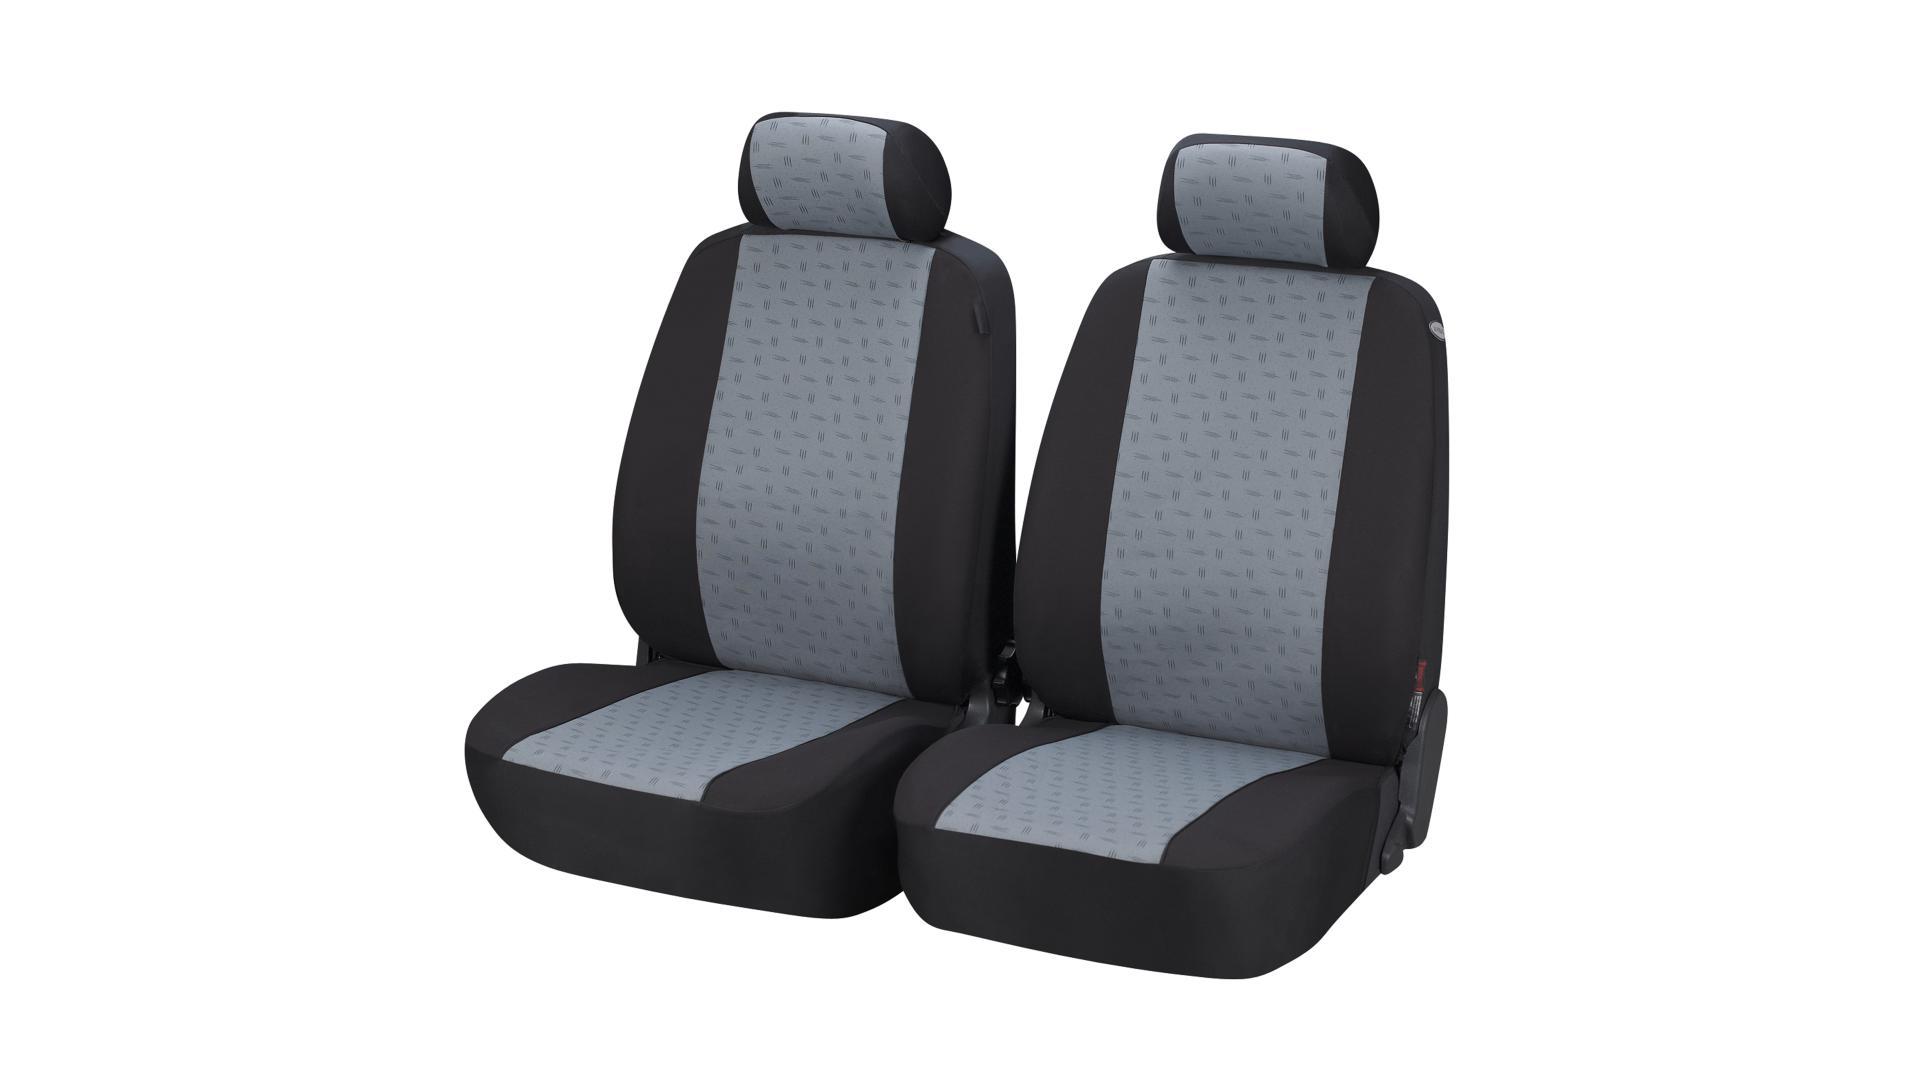 Walser Autopoťah Positano čierno-sivy 2 sedadlá